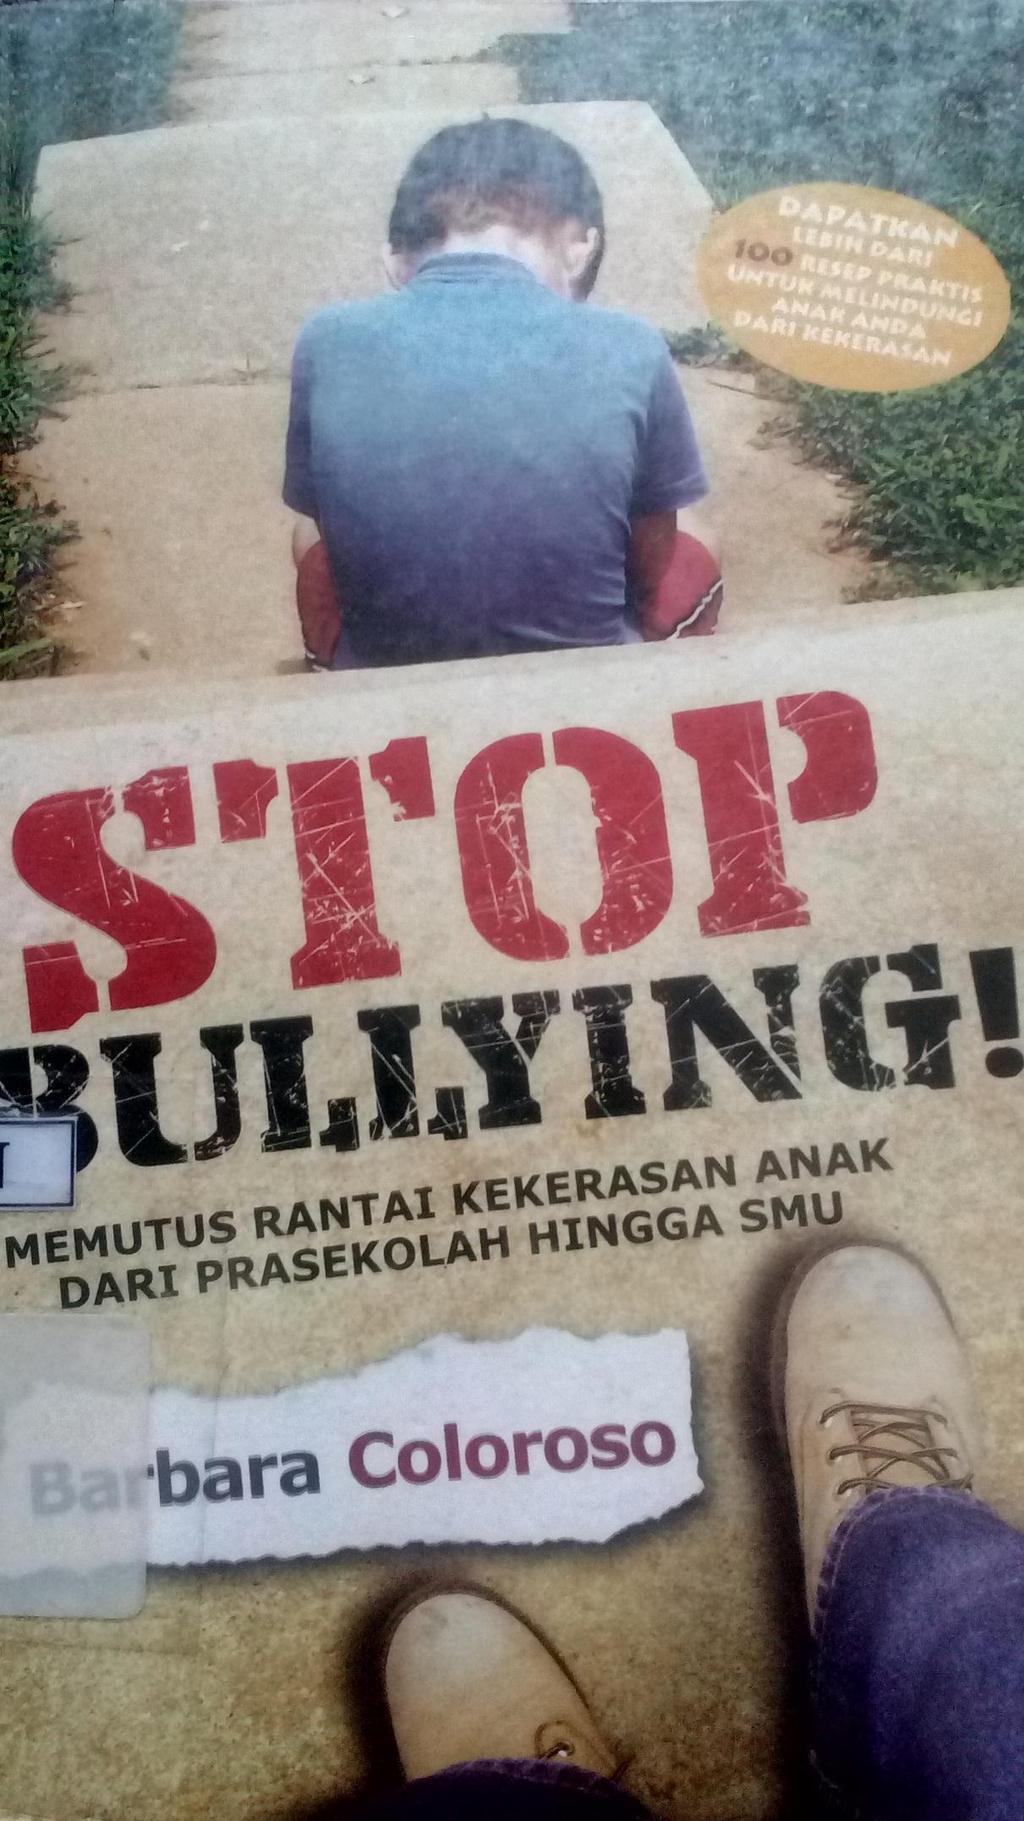 Daftar Buku untuk Topik Anti-Bullying